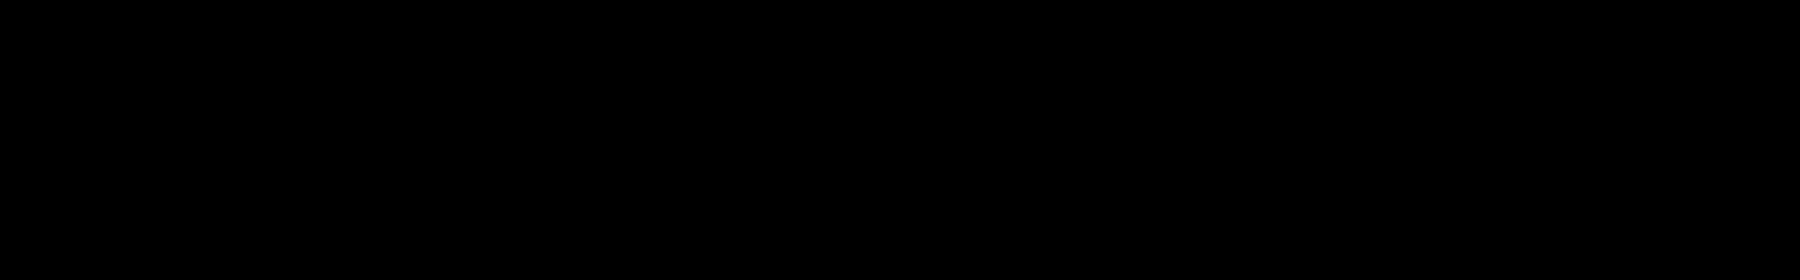 Dark Psytrance MIDI Loops audio waveform